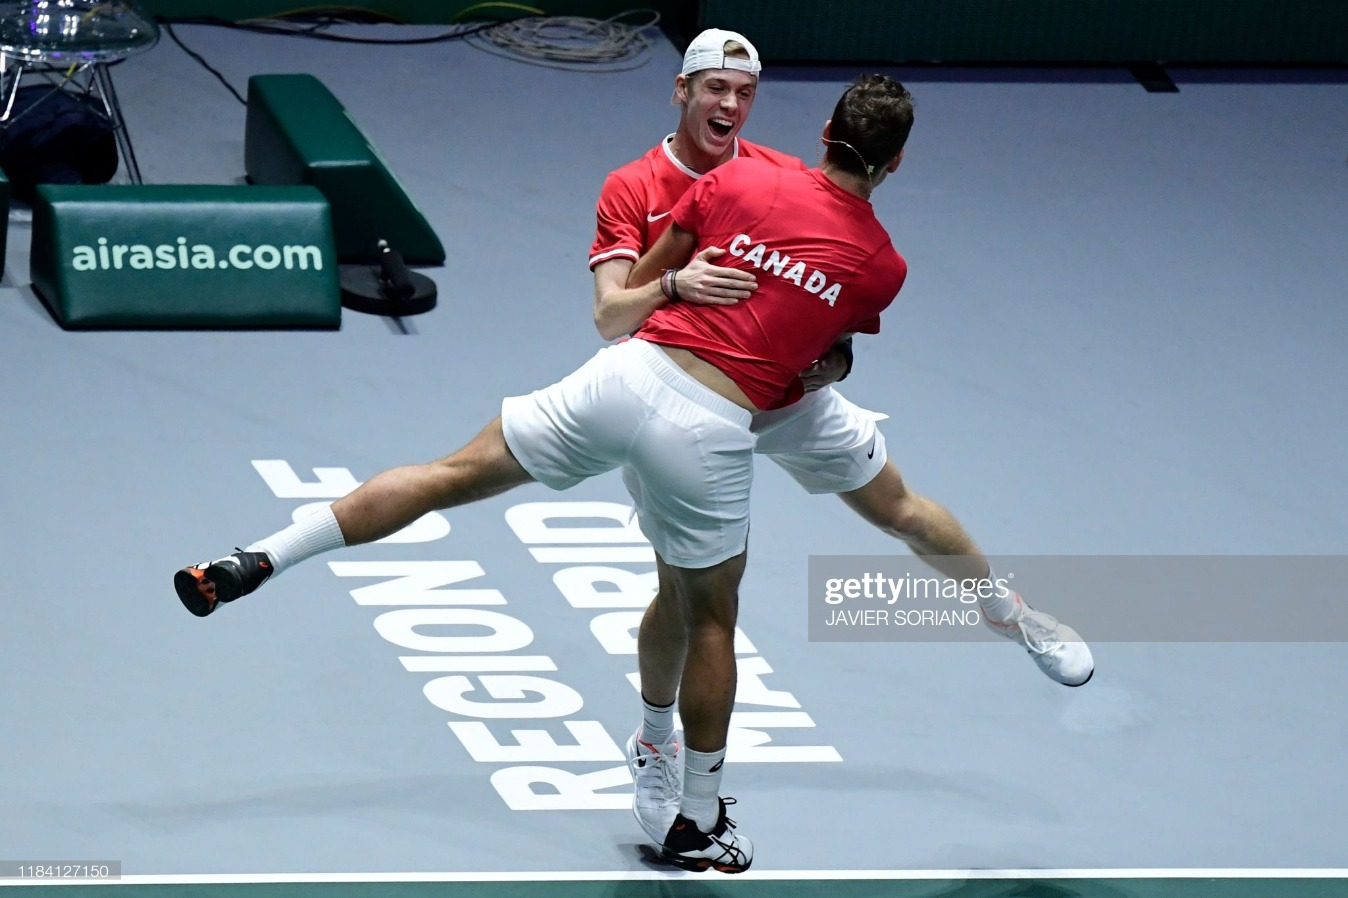 TOPSHOT-TENNIS-DAVIS-RUS-CAN : News Photo